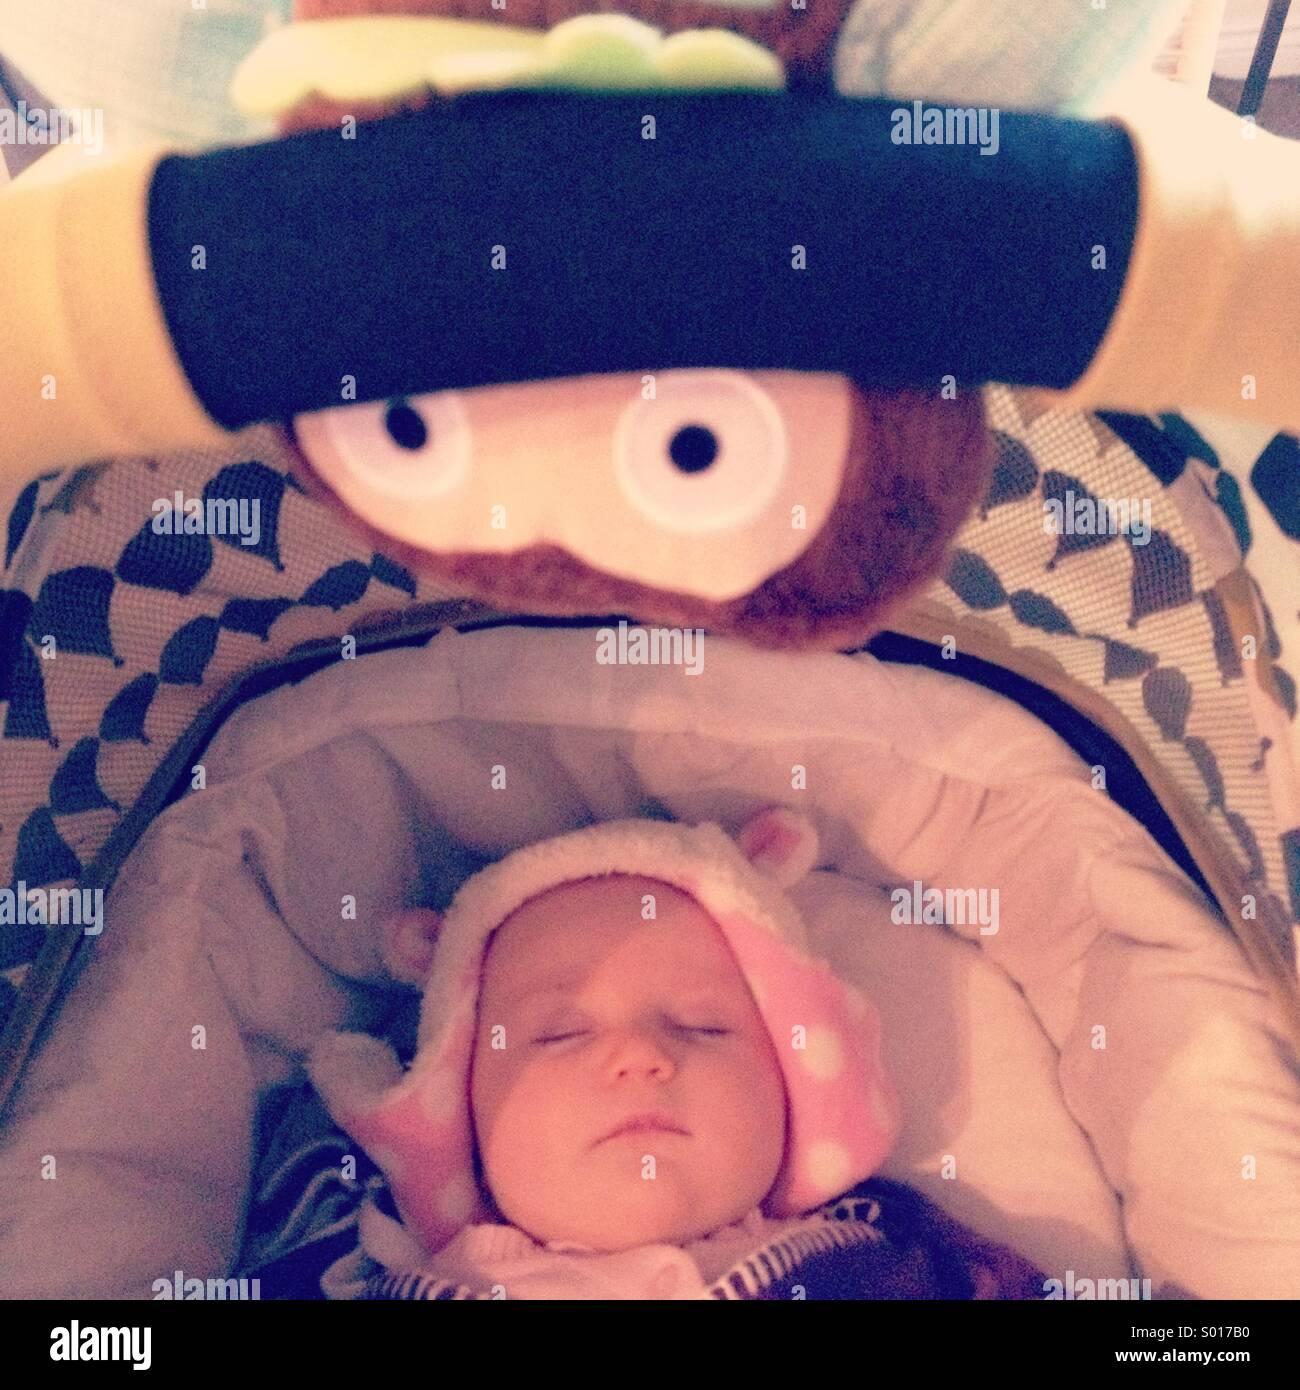 Sleeping baby and baby toy - Stock Image